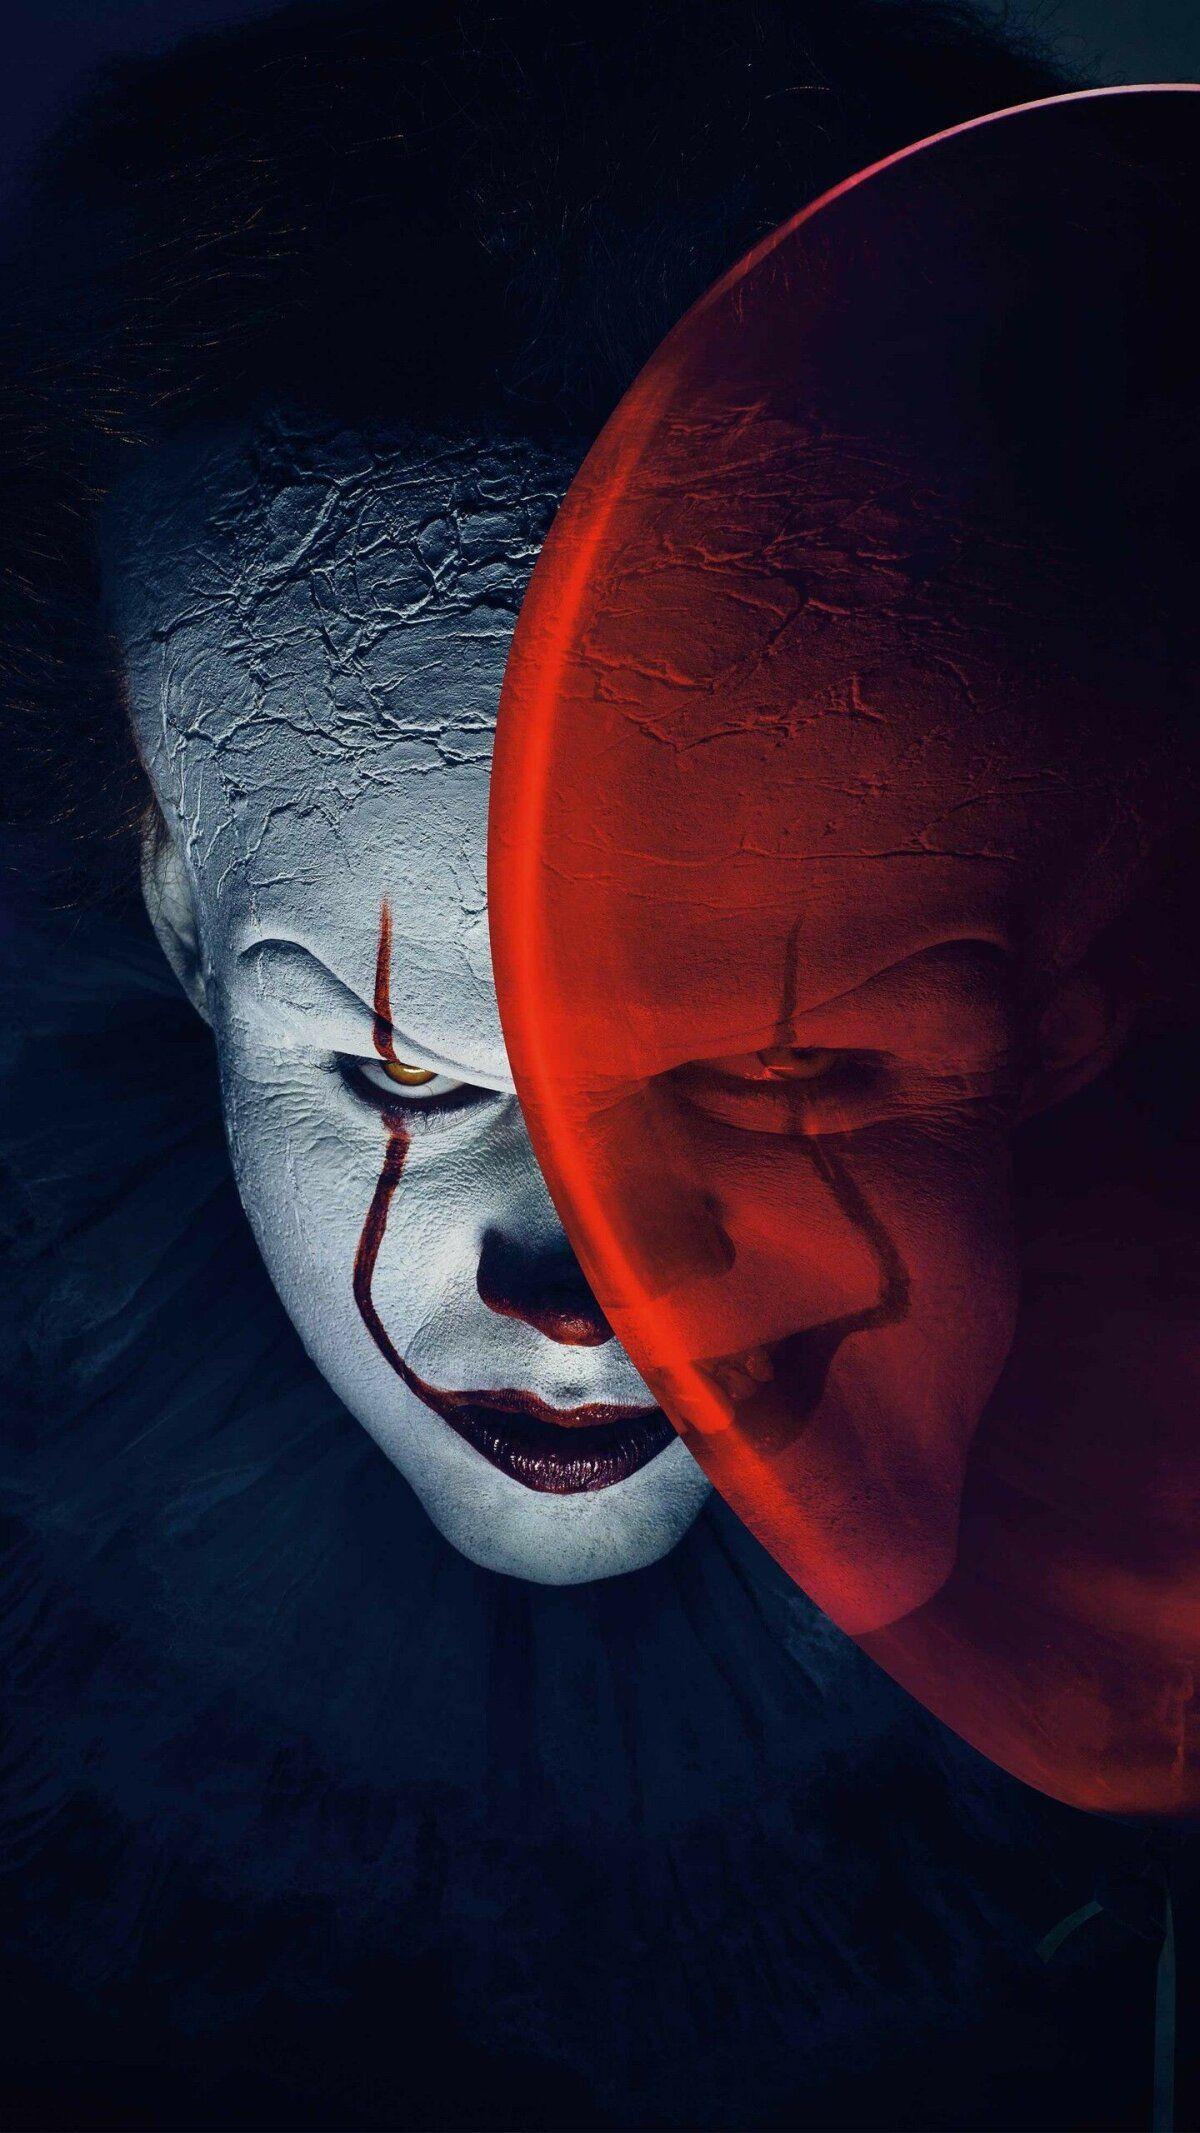 خلفيات رعب Horror مخيف Scary مرعب عالية الوضوح 185 Papel De Parede Terror Filmes Classicos De Terror Palhacos Assustadores